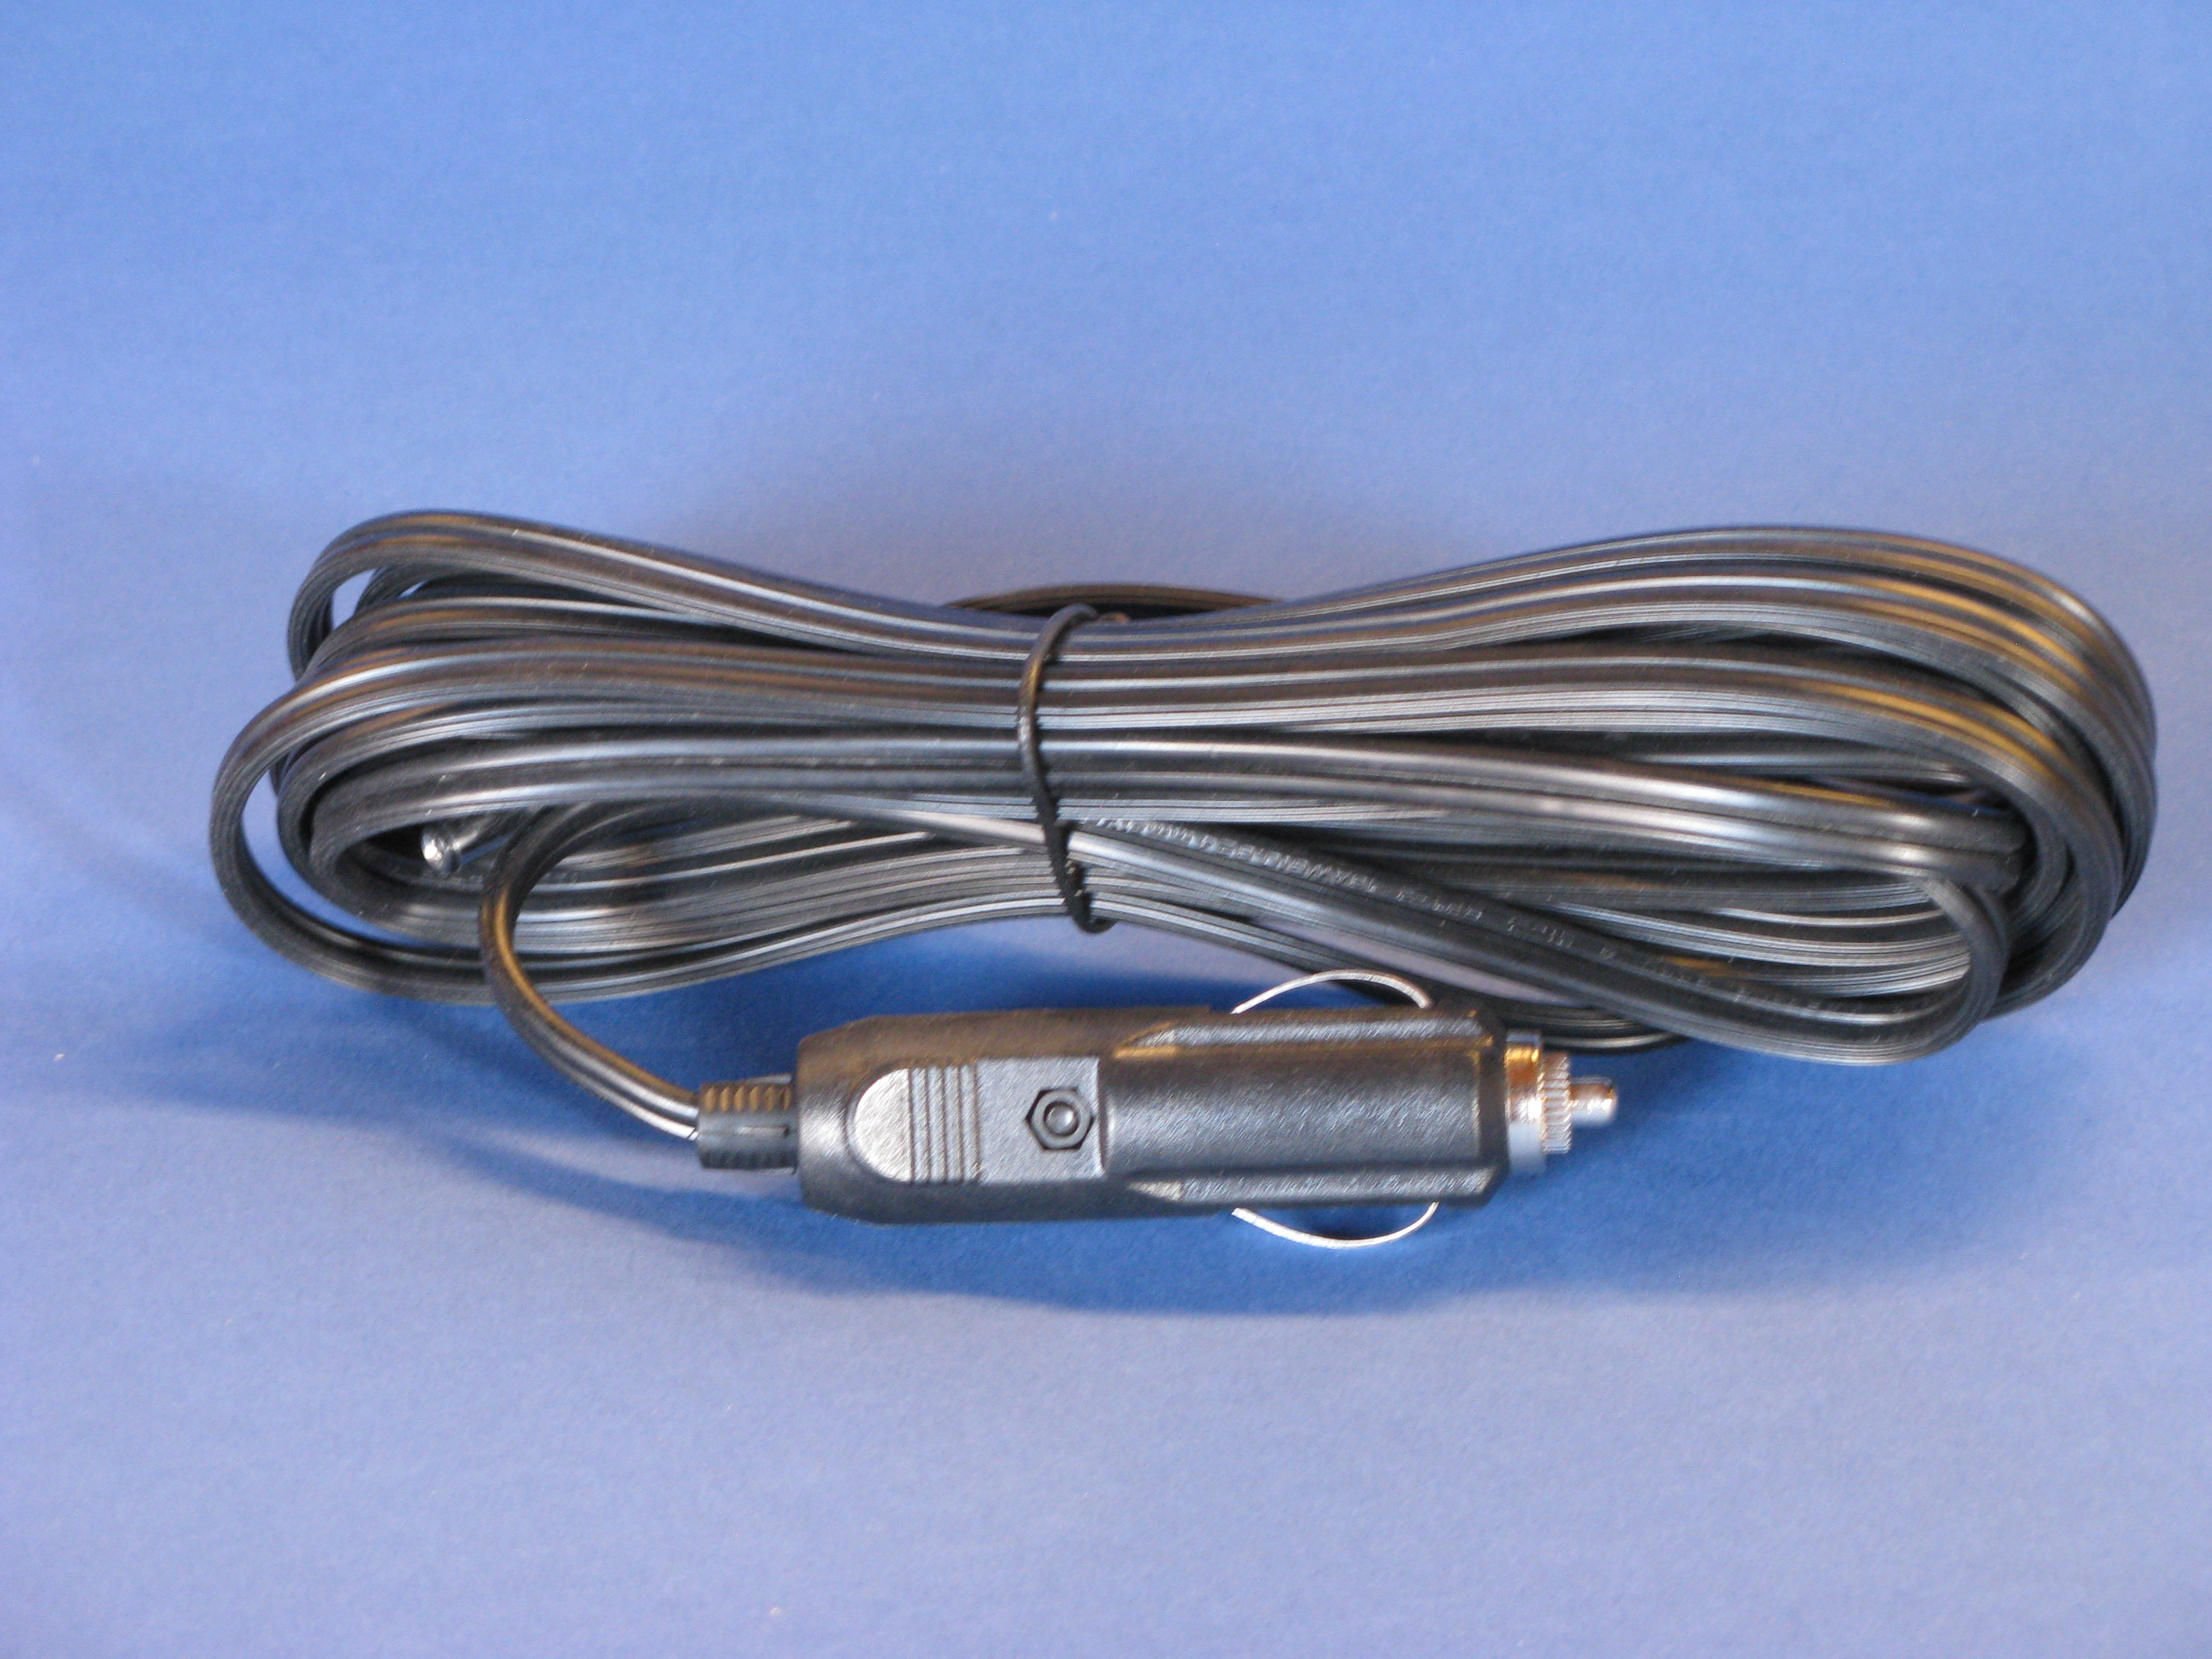 25CordwDConnector